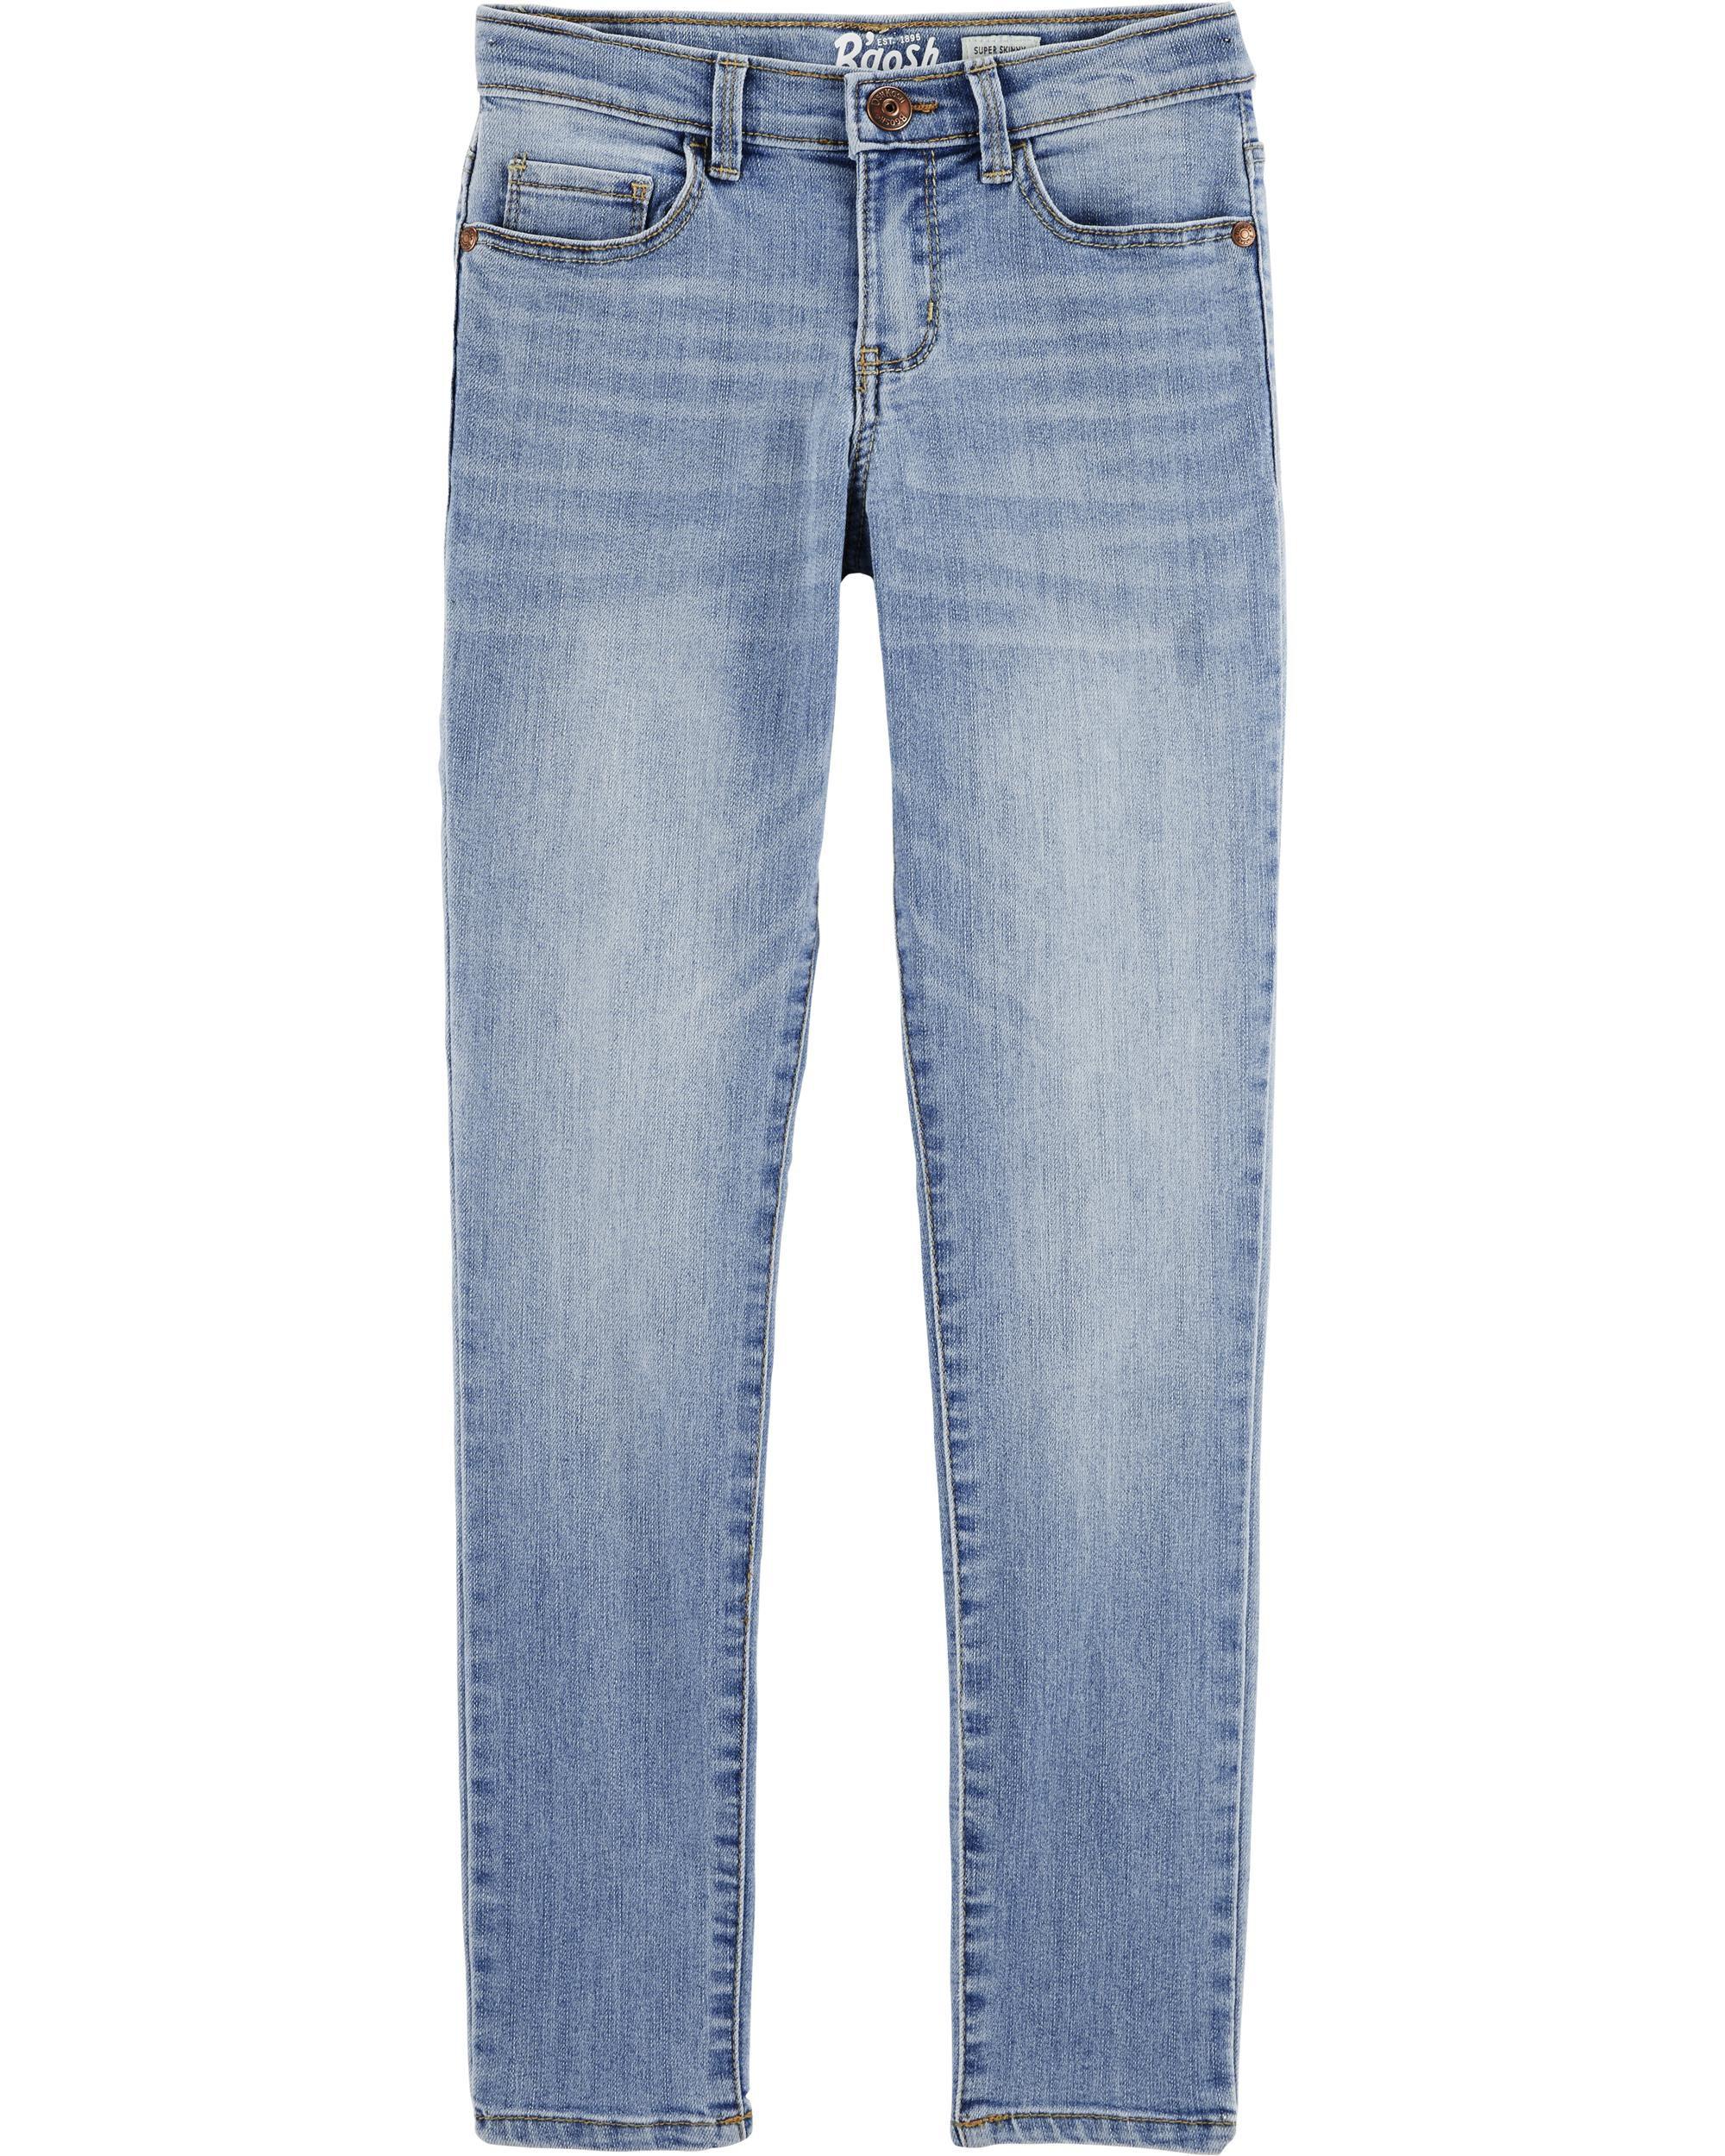 *DOORBUSTER*Super Skinny Jeans - Winchester Wash